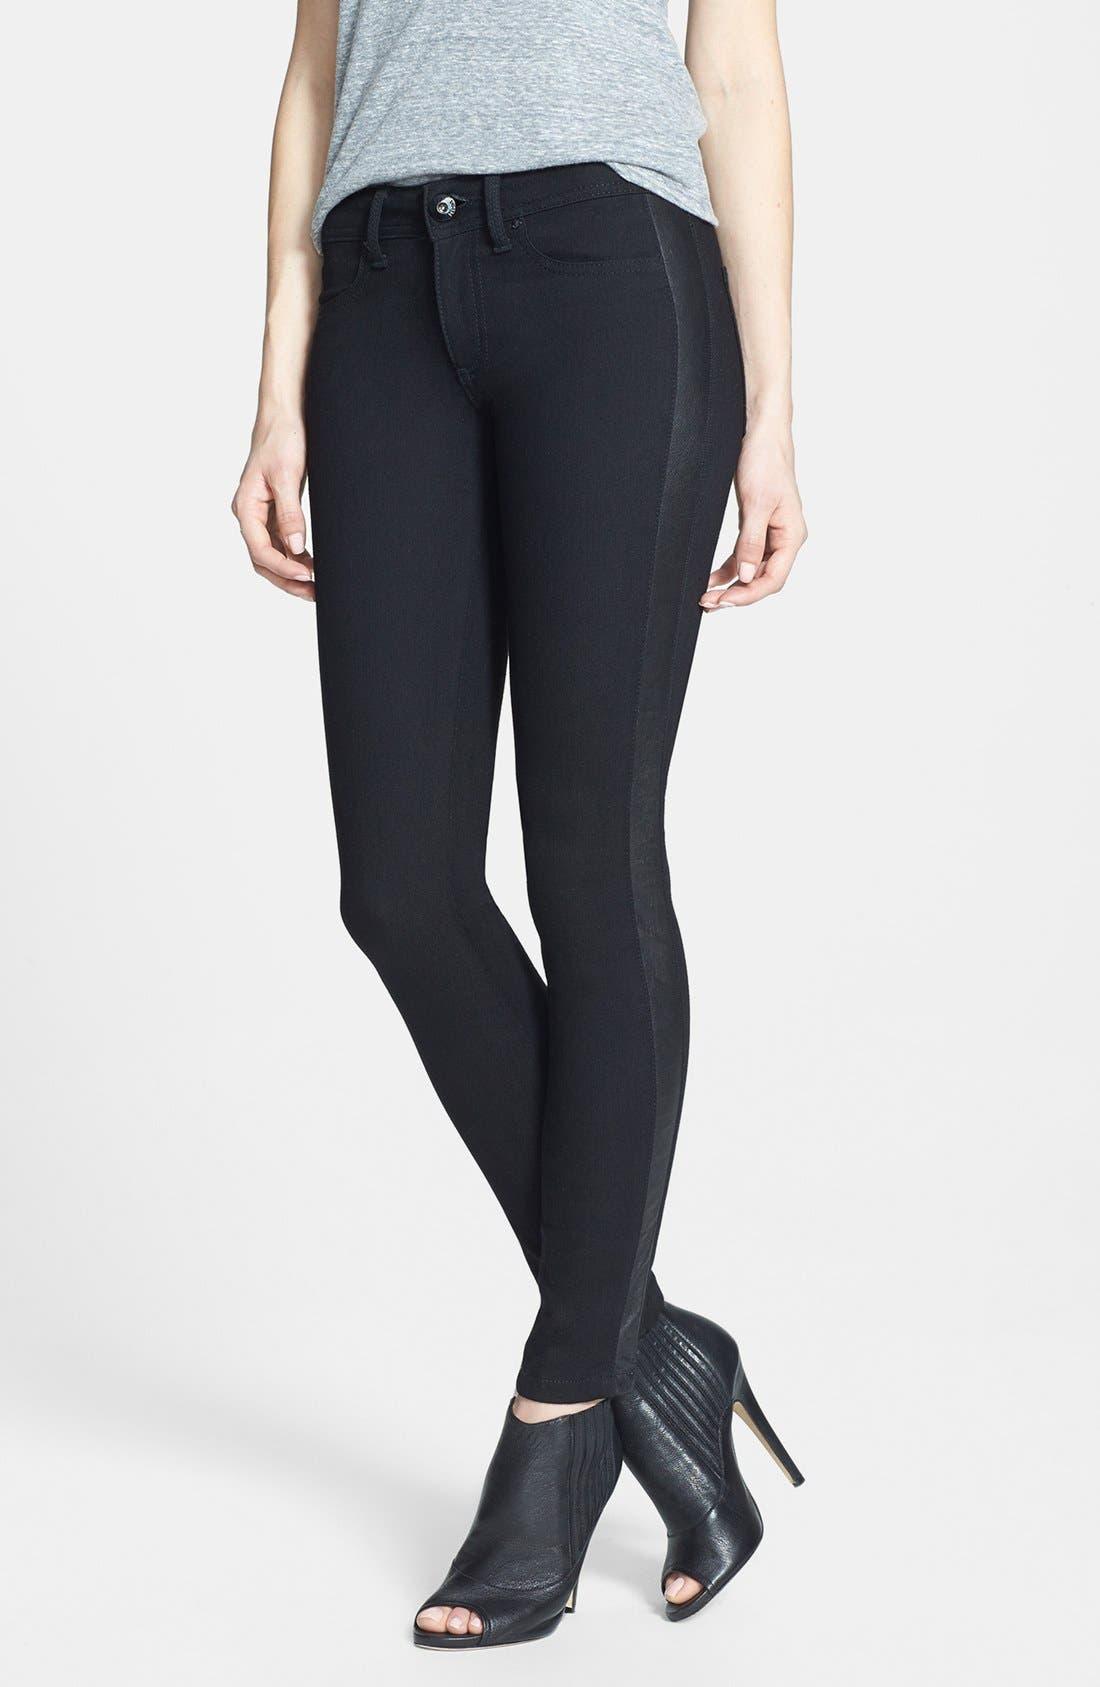 Main Image - DL1961 'Emma' Leather Tuxedo Stripe Skinny Jeans (Ravenna)